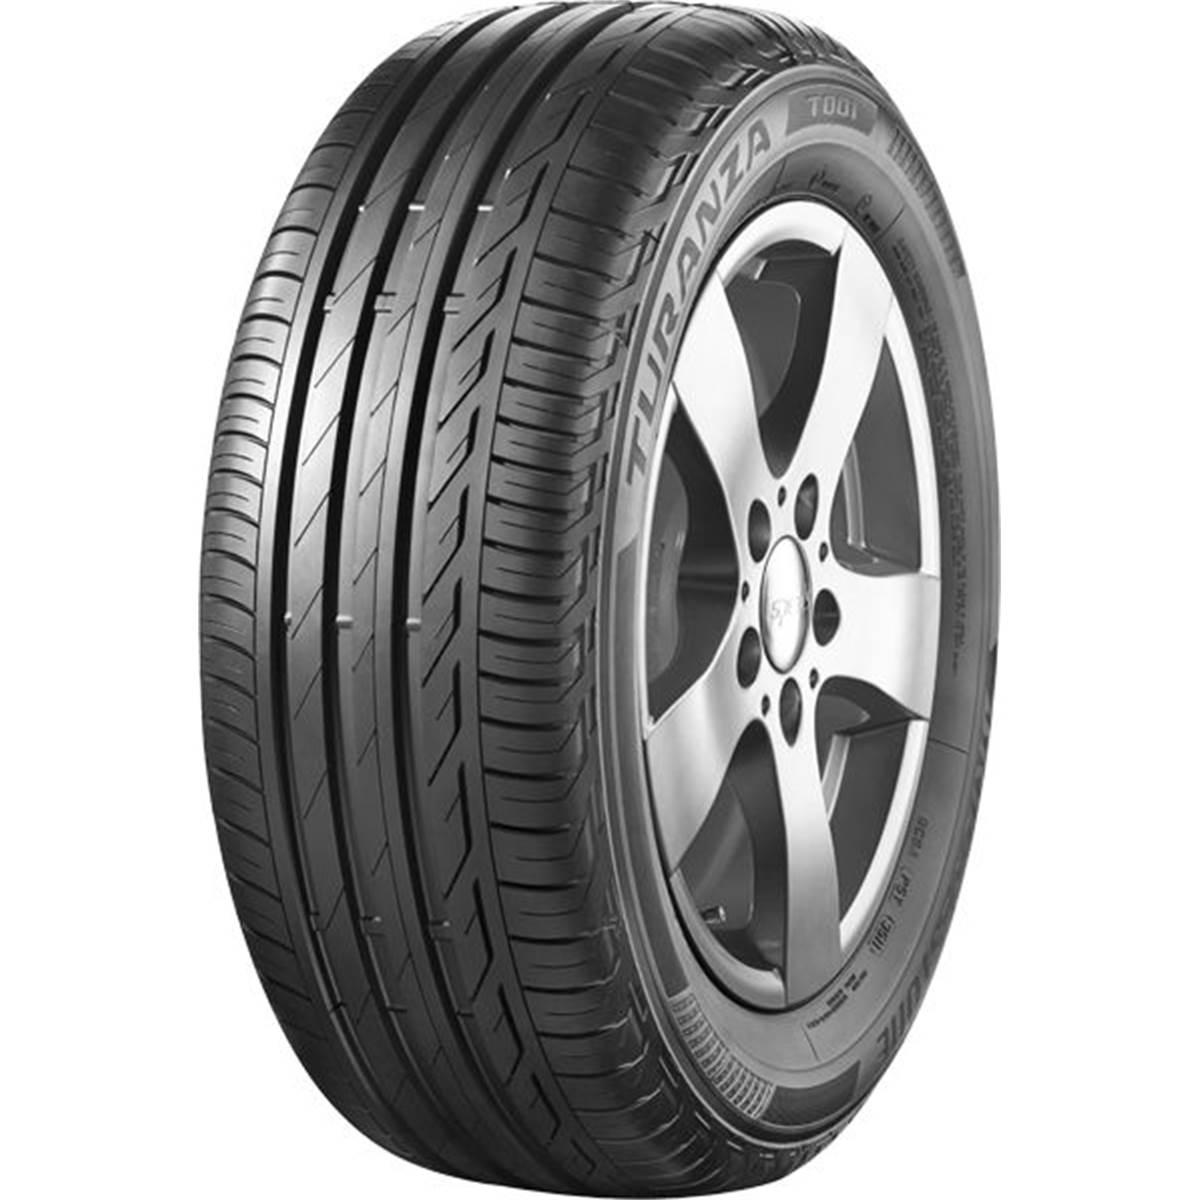 Pneu Bridgestone 215/65R15 96H Turanza T001